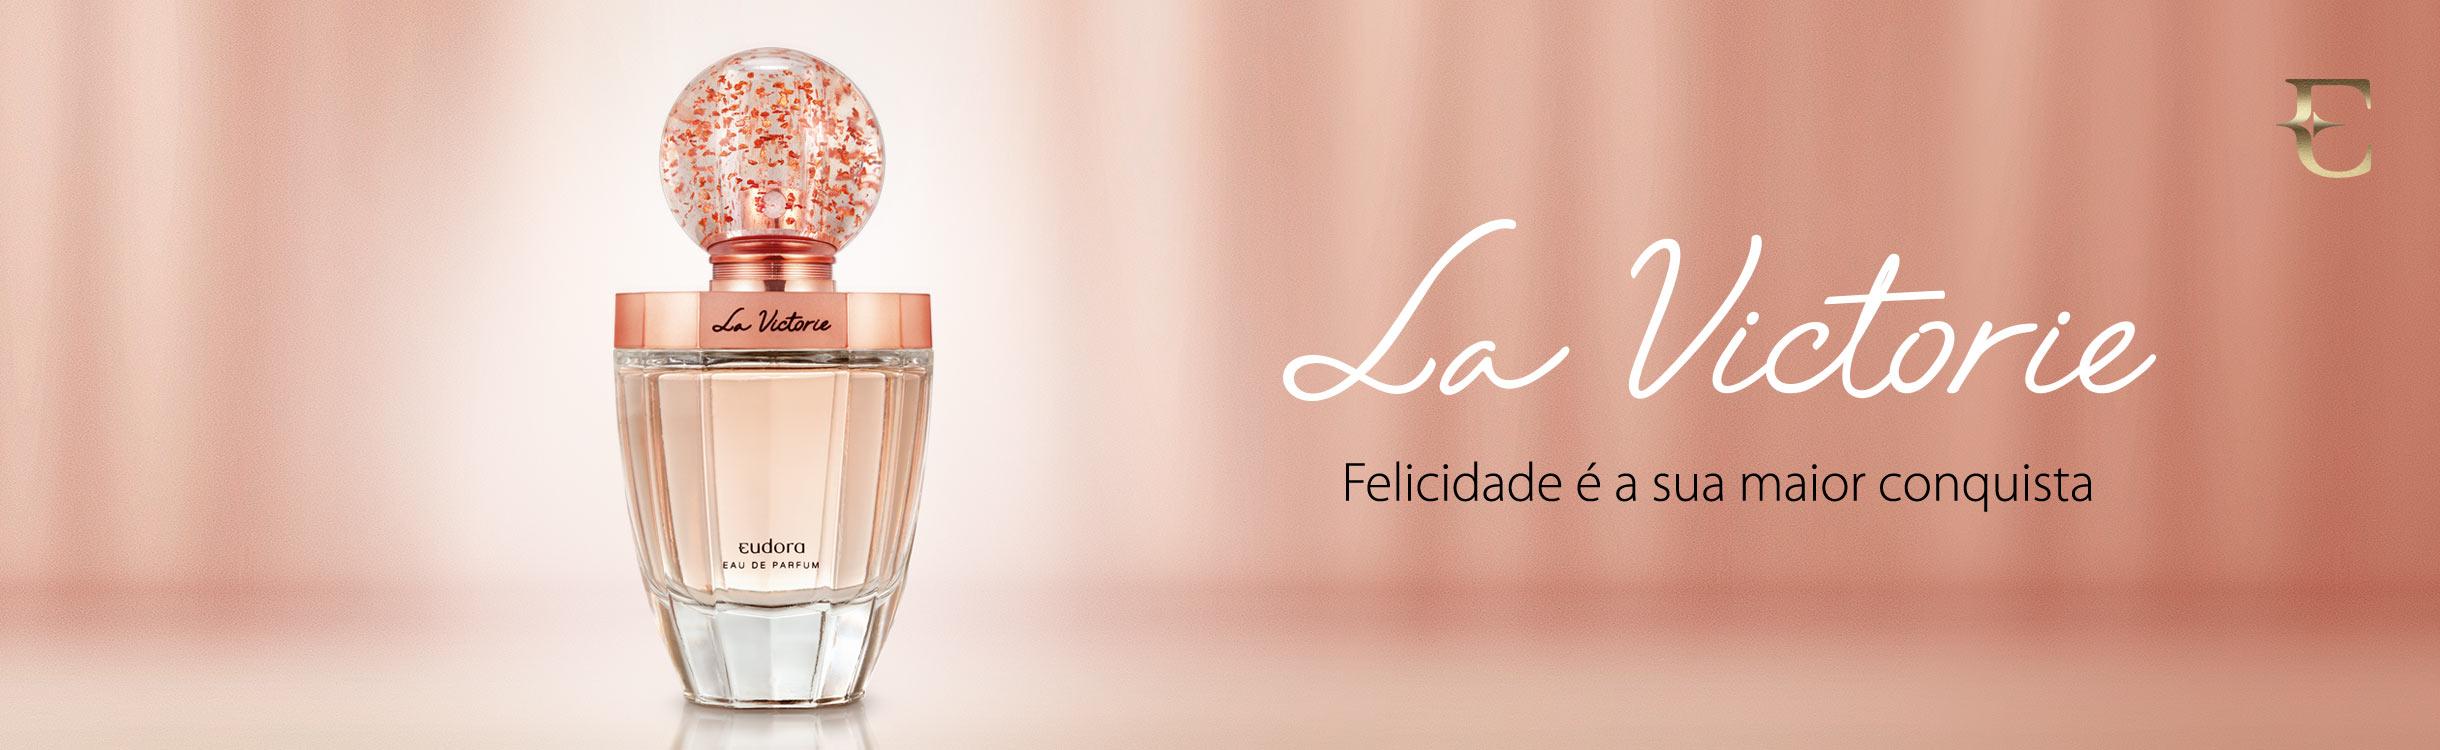 La Victorie: Perfumaria Feminina